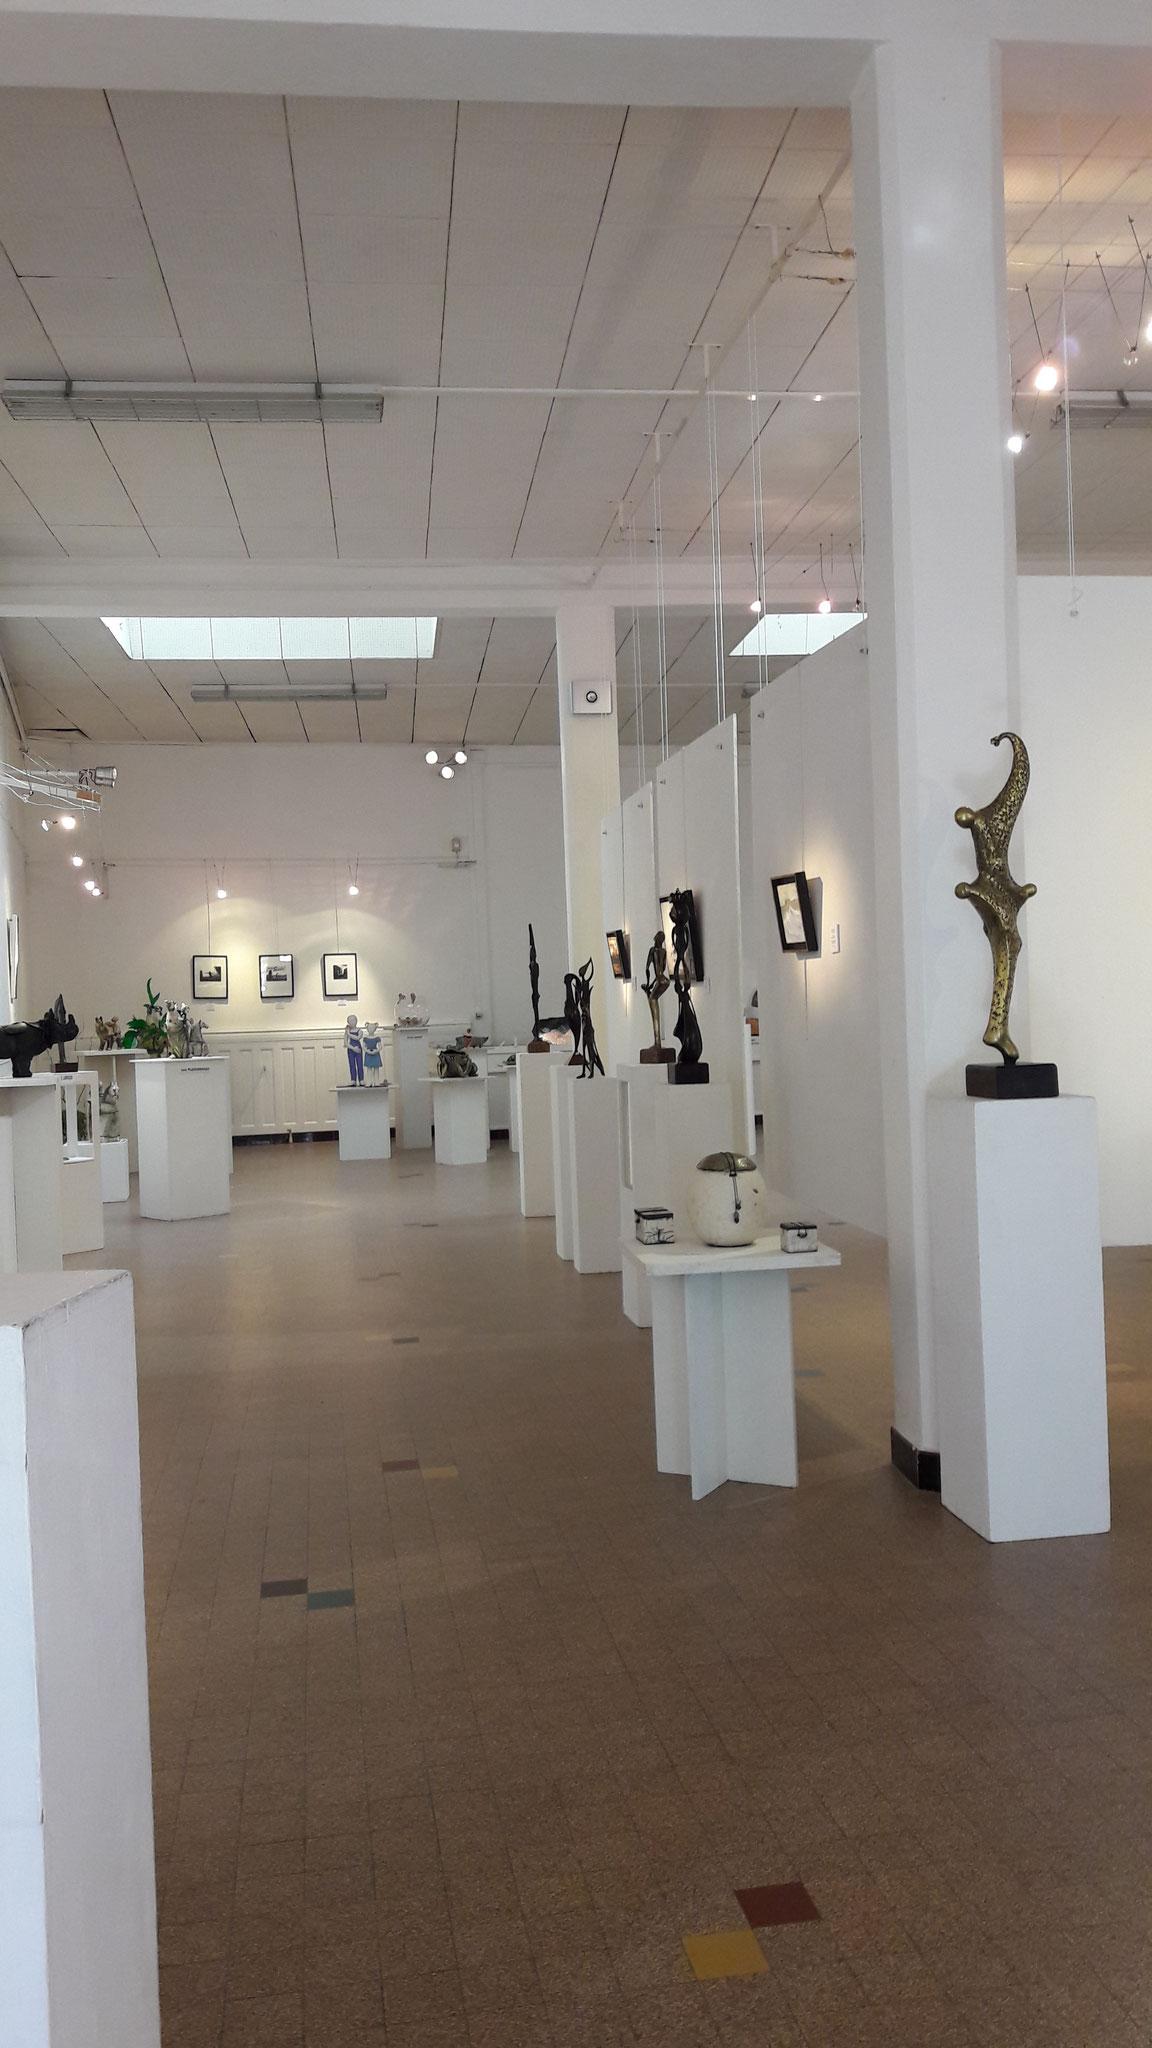 2016 - 82 Auvilllar - Galerie Arts'kad